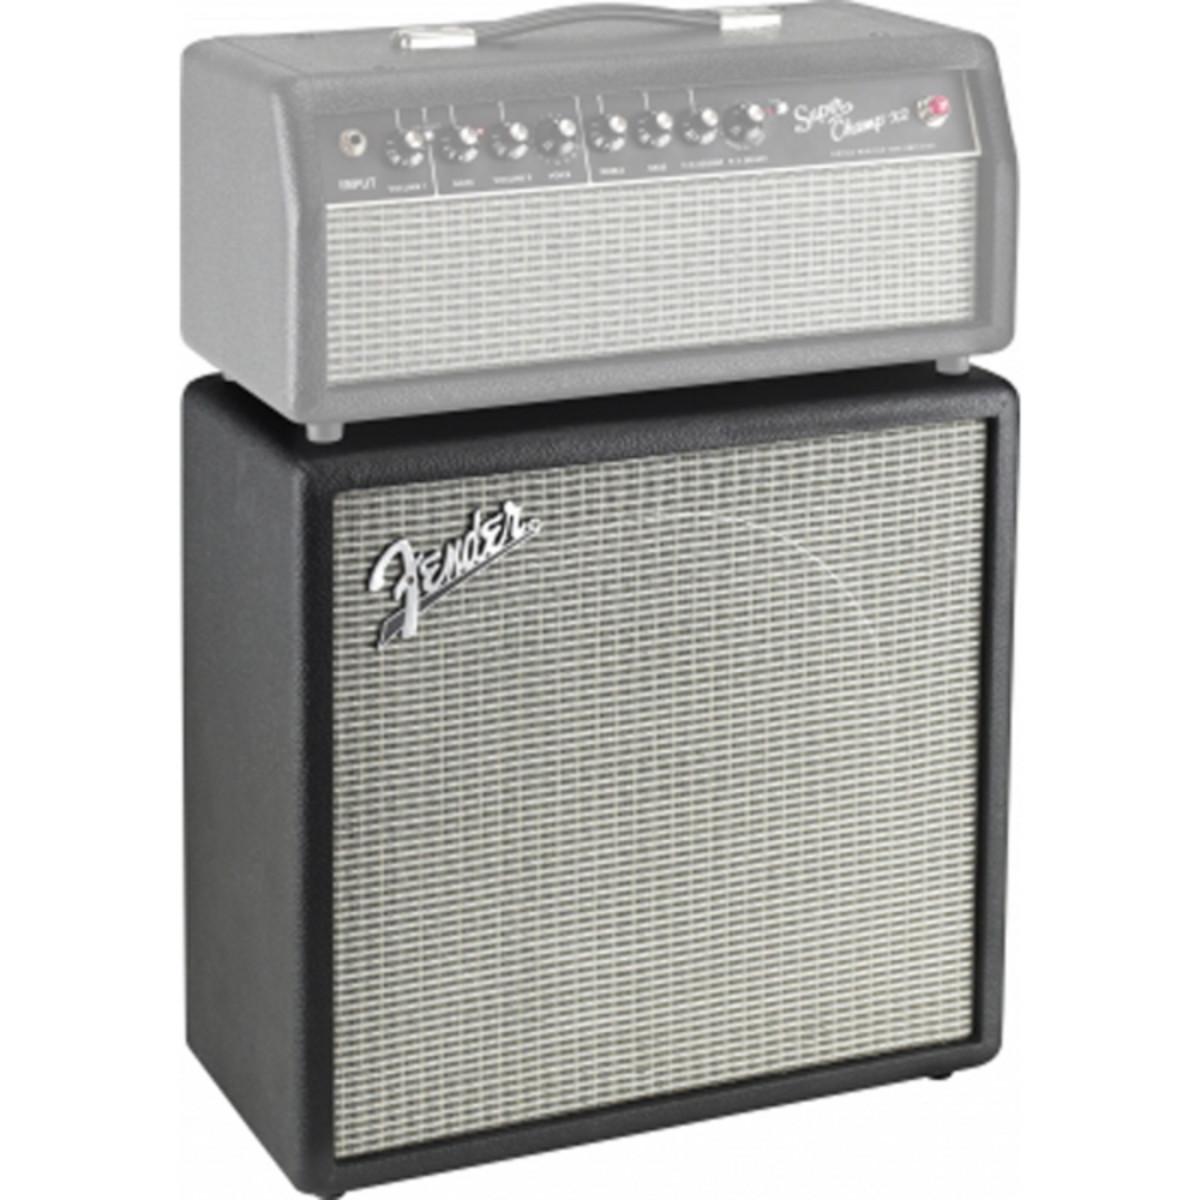 Fender Super Champ SC112 Guitar Speaker Cab - Nearly New